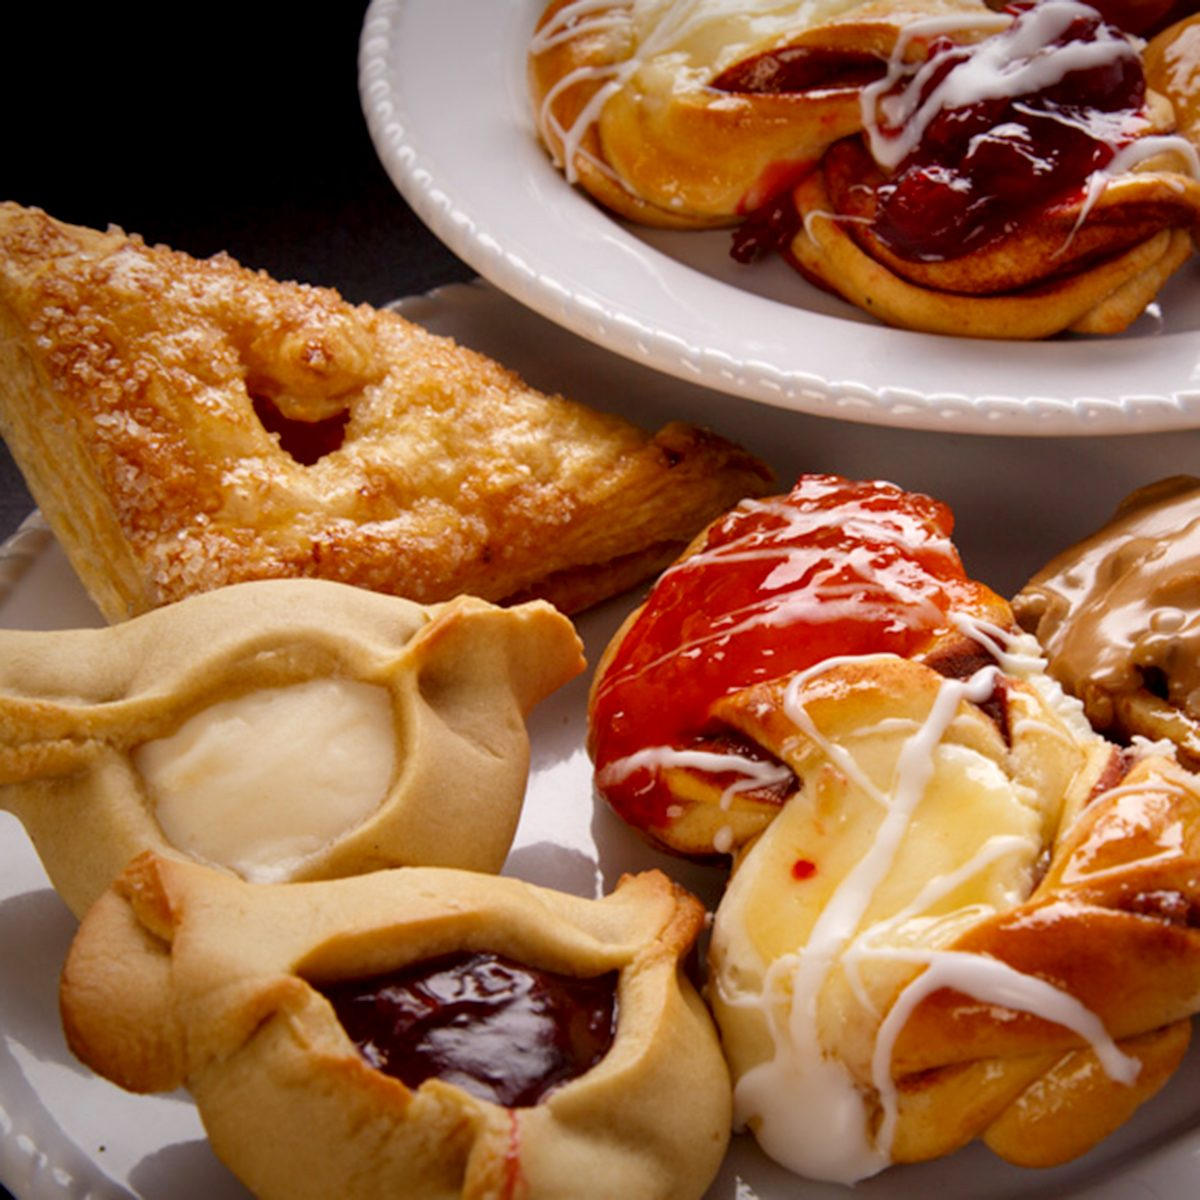 pastries on plates Ingrid's Kitchen, Oklahoma City